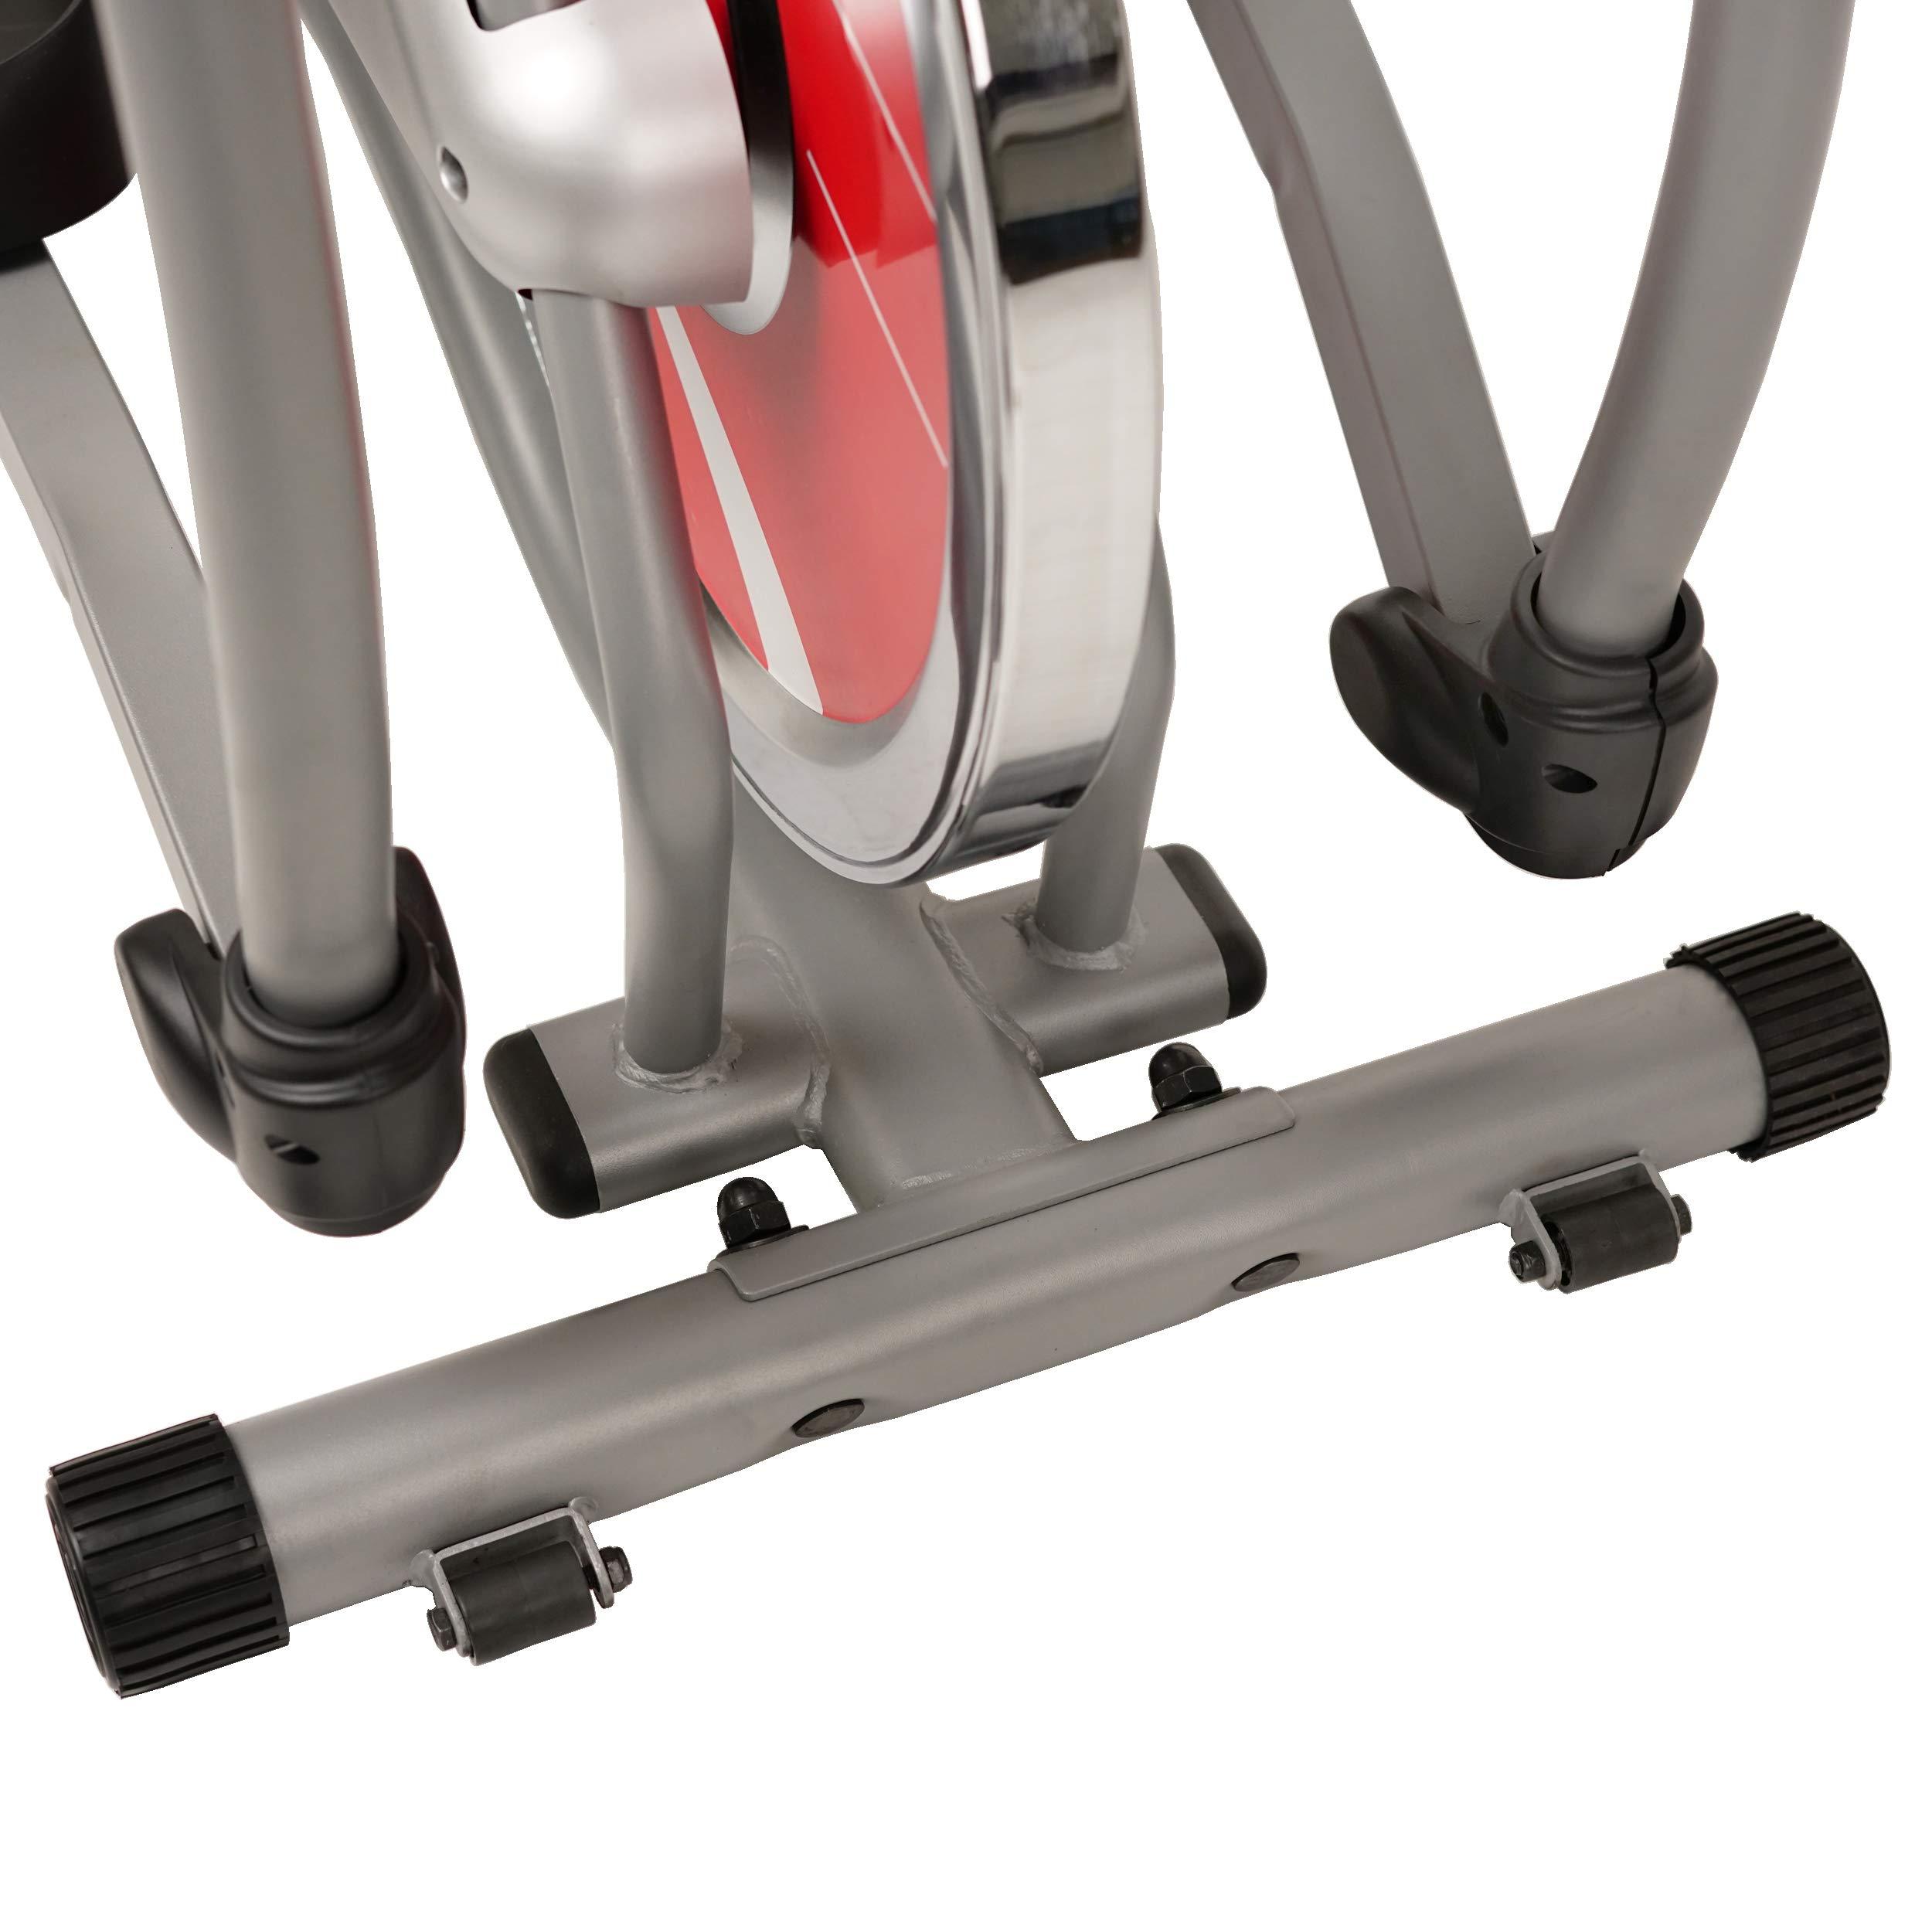 Sunny Health & Fitness SF-E1405 Flywheel Elliptical Trainer, Gray by Sunny Health & Fitness (Image #9)